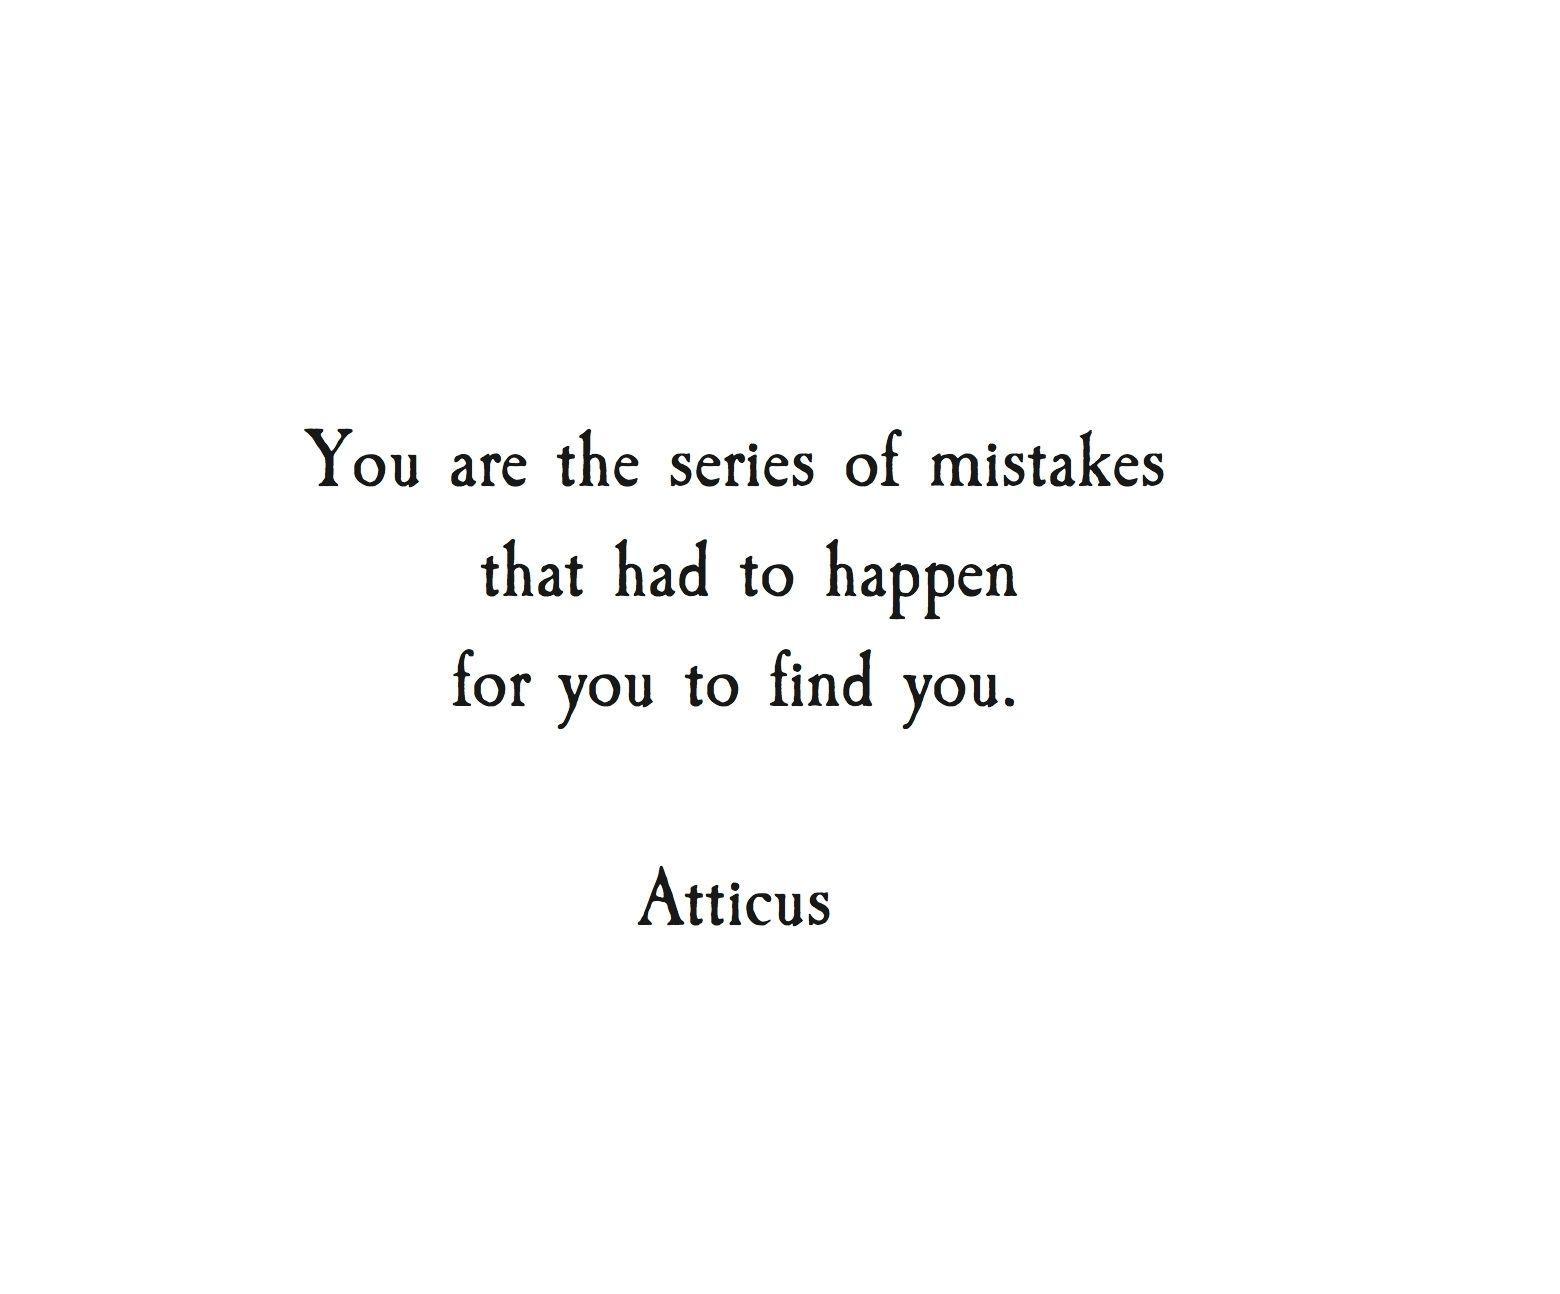 Quotes Pinterest Pinterest Idaliax0✨  Words  Pinterest  Poem Atticus Quotes